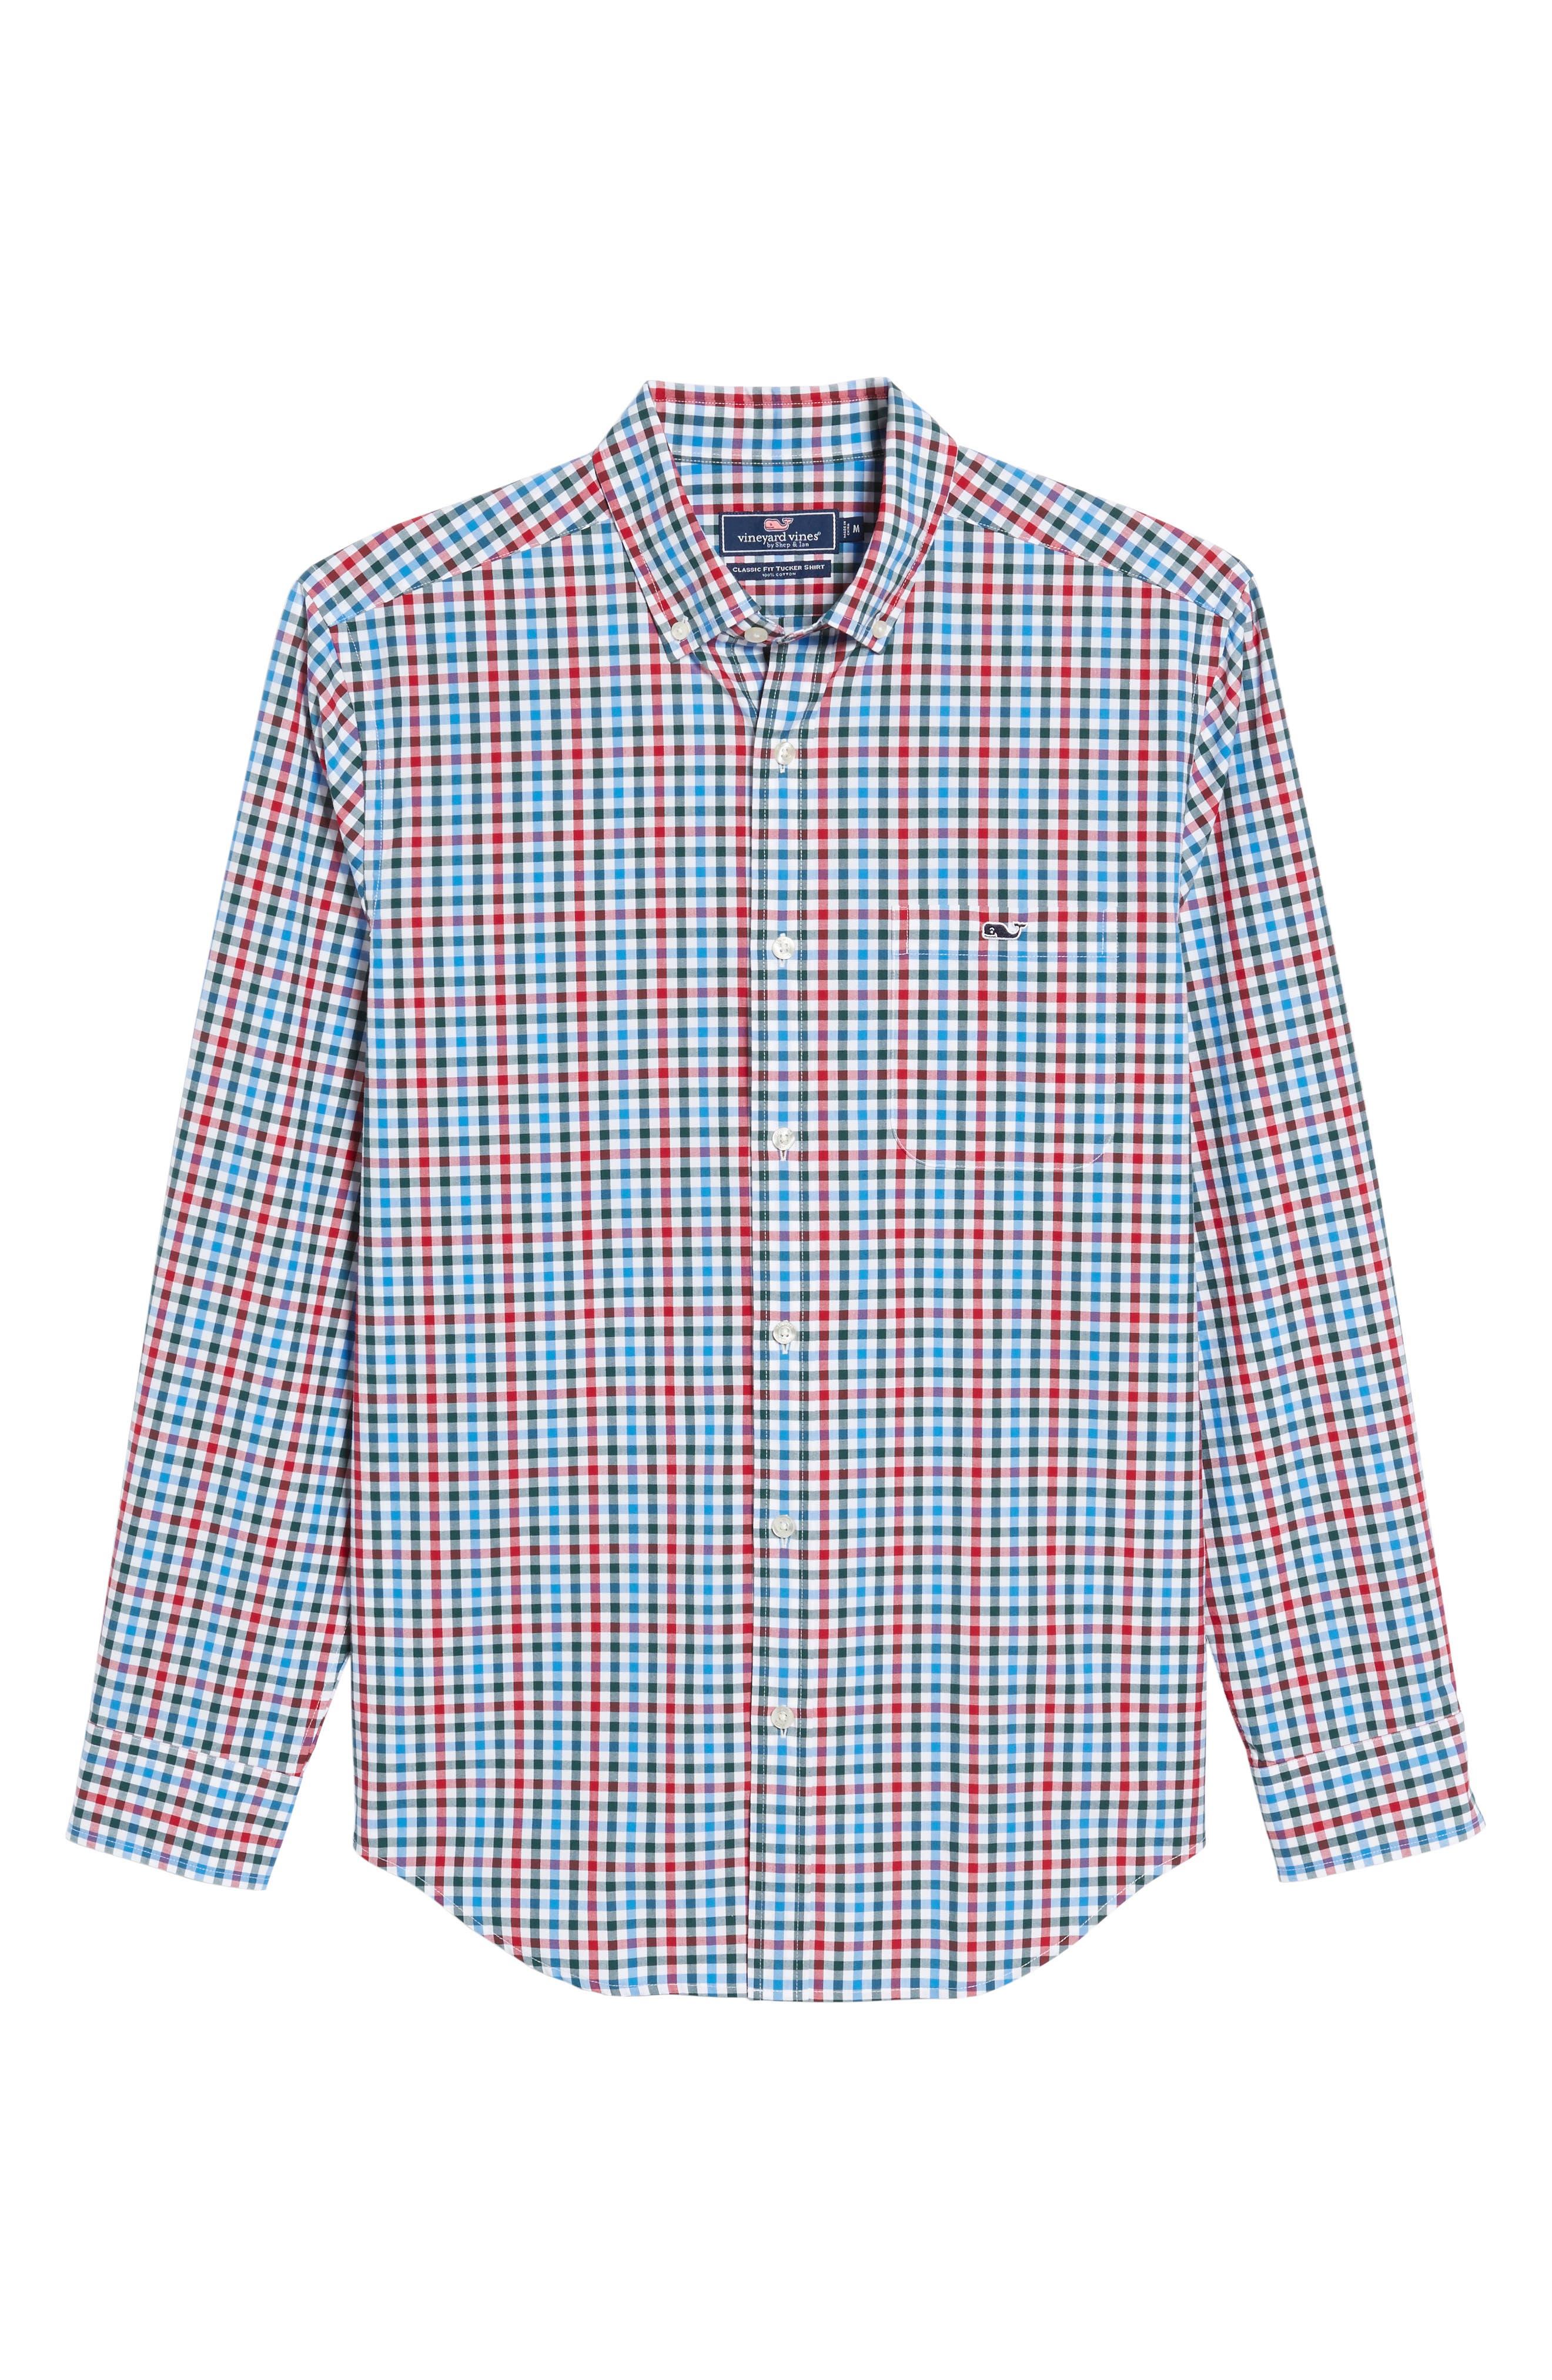 Higgins Beach Classic Fit Gingham Sport Shirt,                             Alternate thumbnail 6, color,                             620